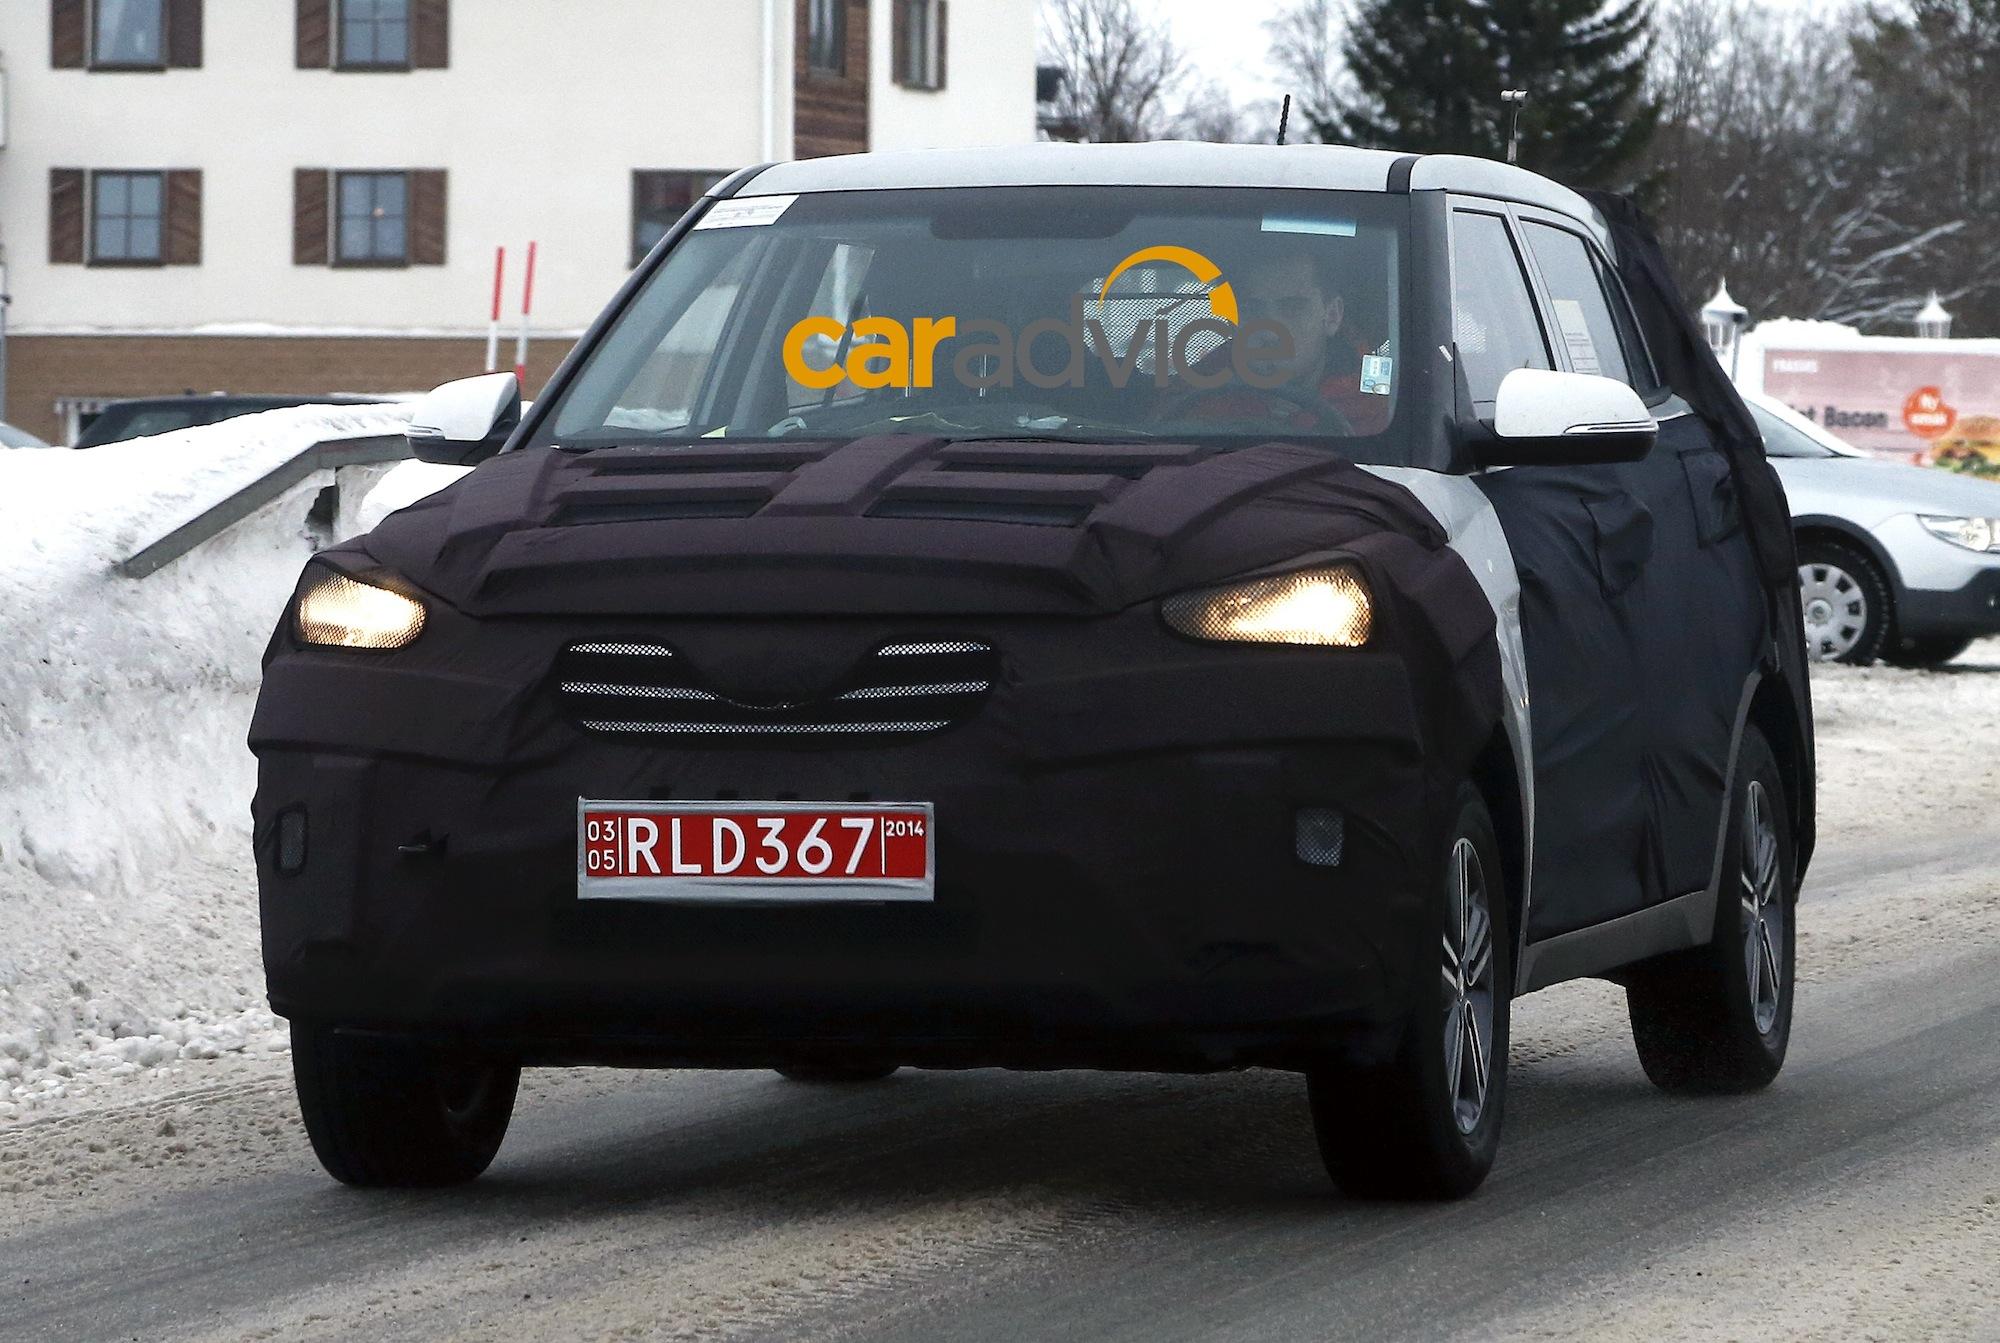 Home car hyundai spied hyundai ix25 compact suv interior - Hyundai Ix25 Sub Compact Suv Spied